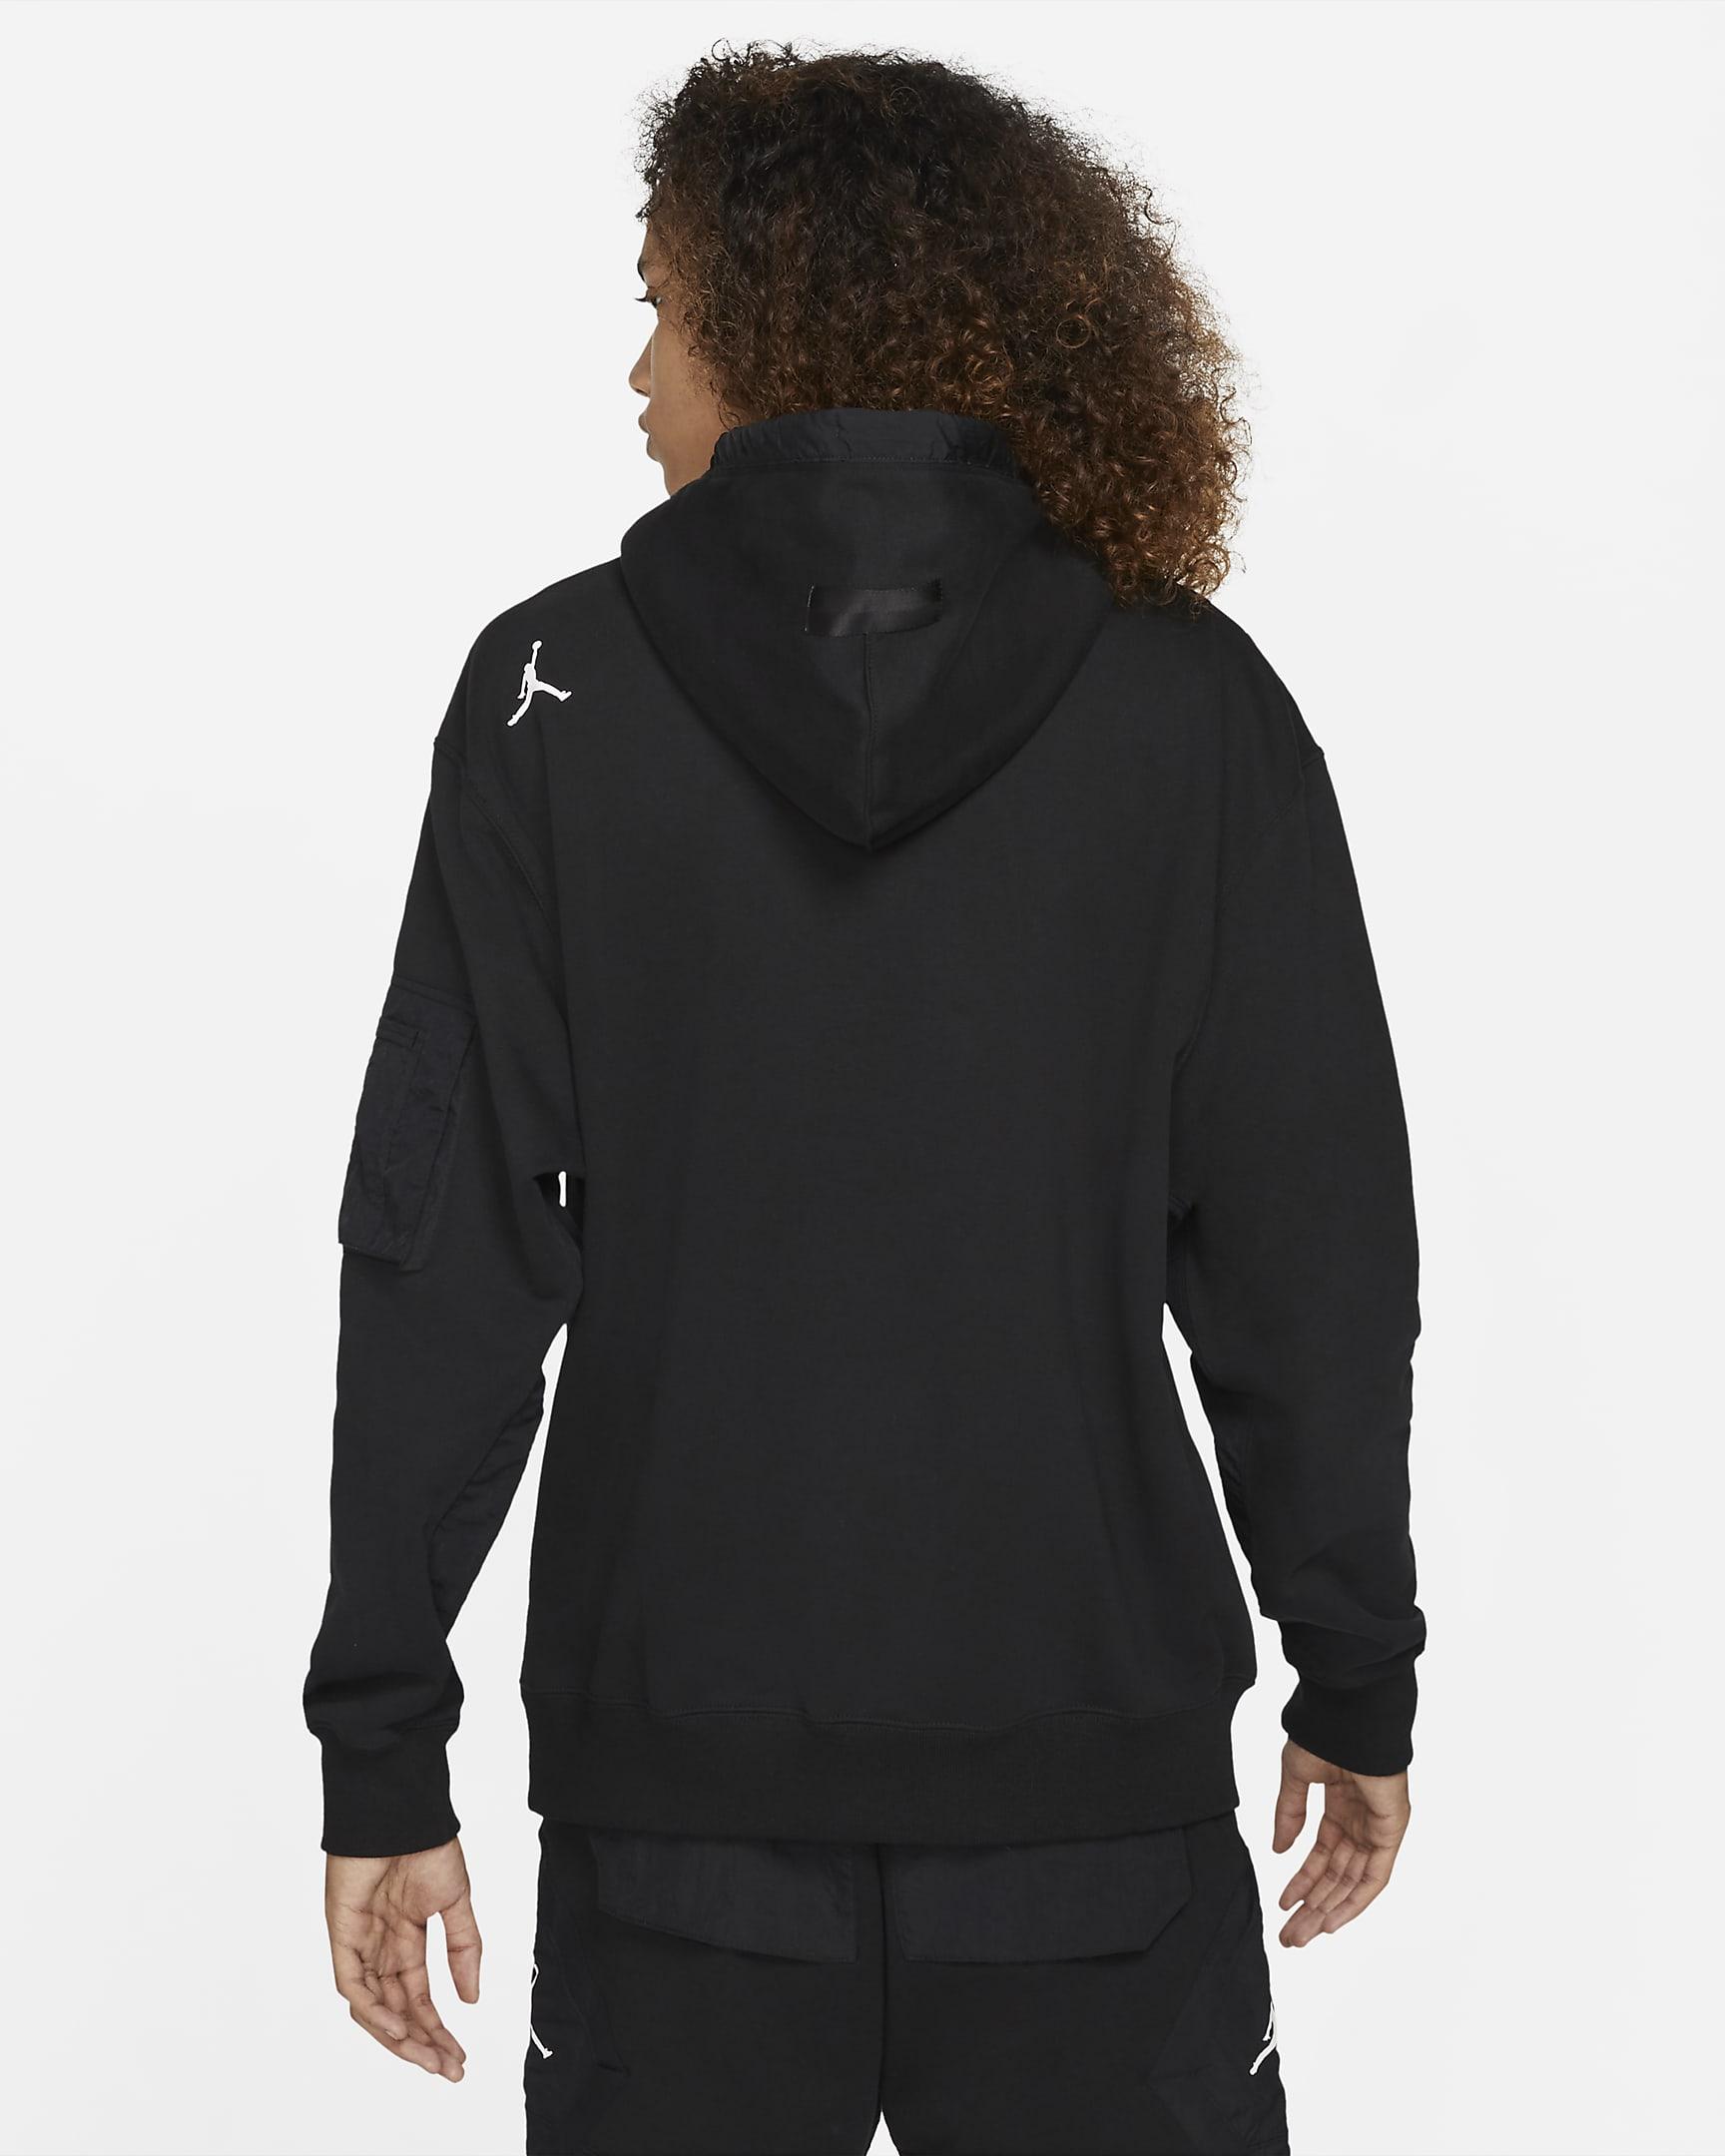 jordan-23-engineered-mens-fleece-pullover-hoodie-QbRhJ5-1.png